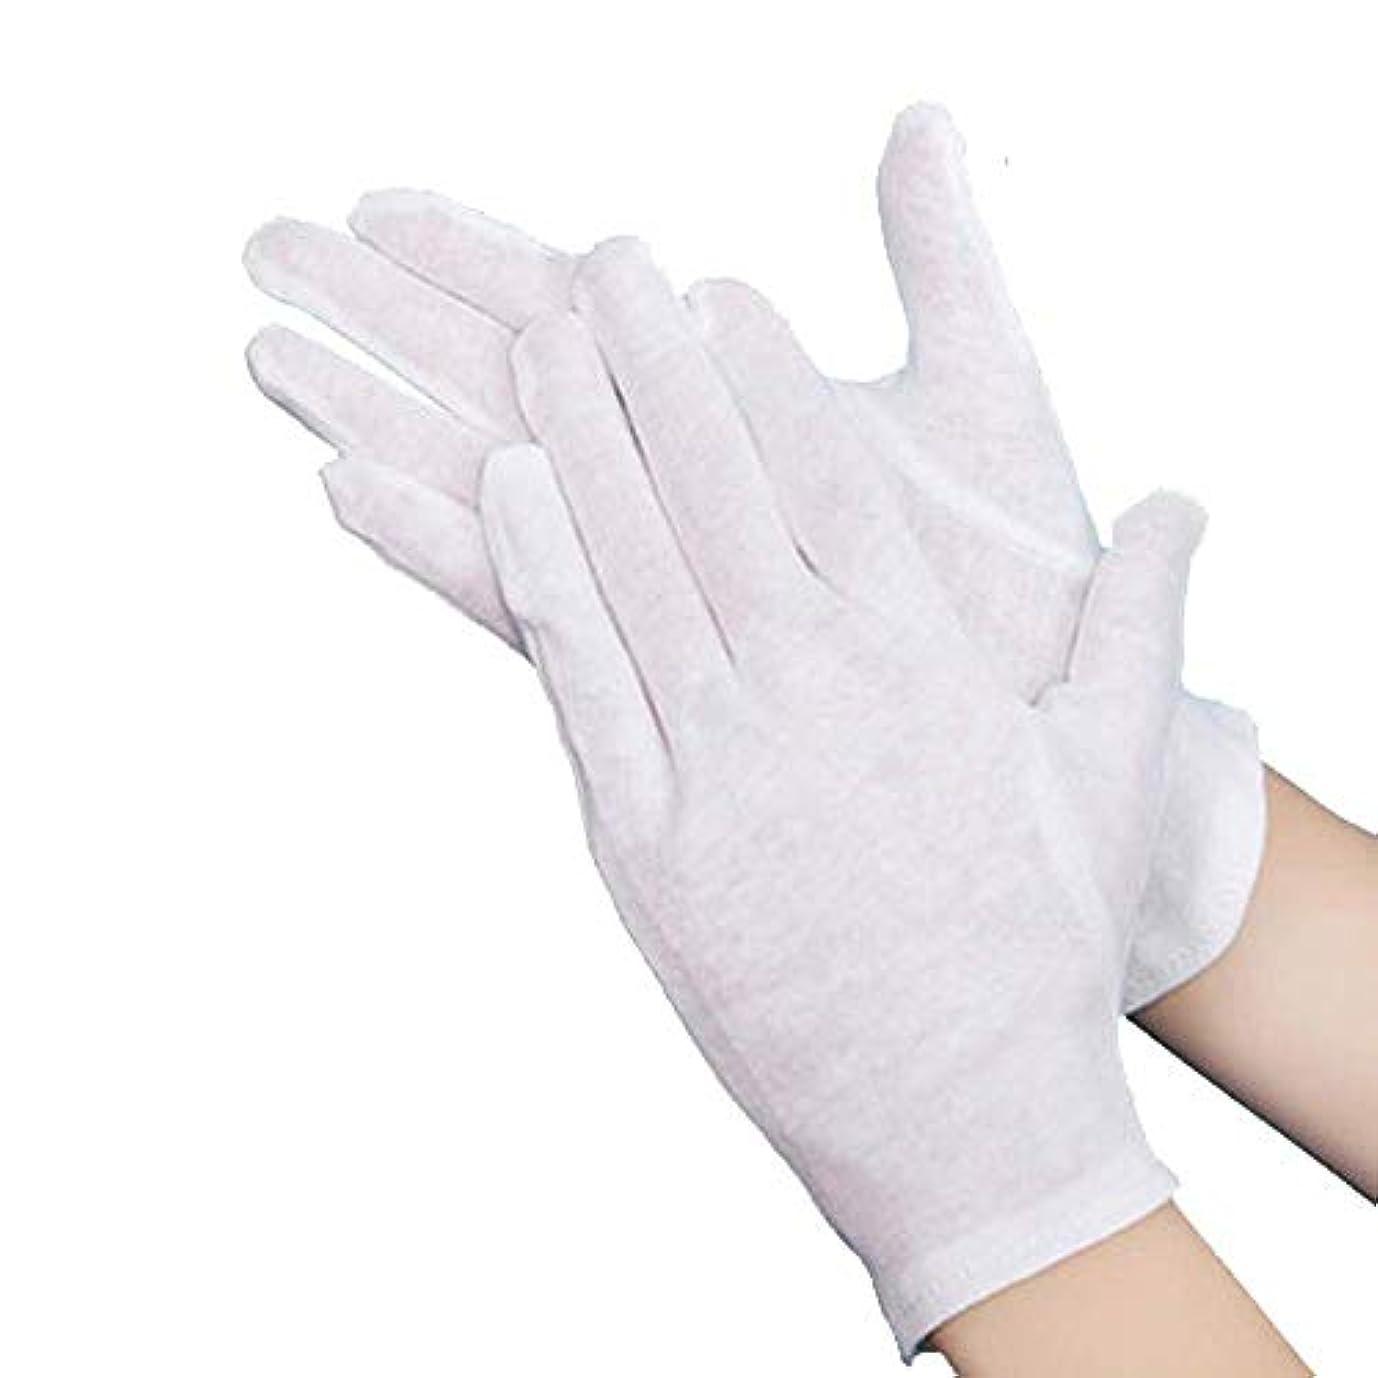 豊富状態ゴム10双組 M トン手袋 綿手袋 通気性